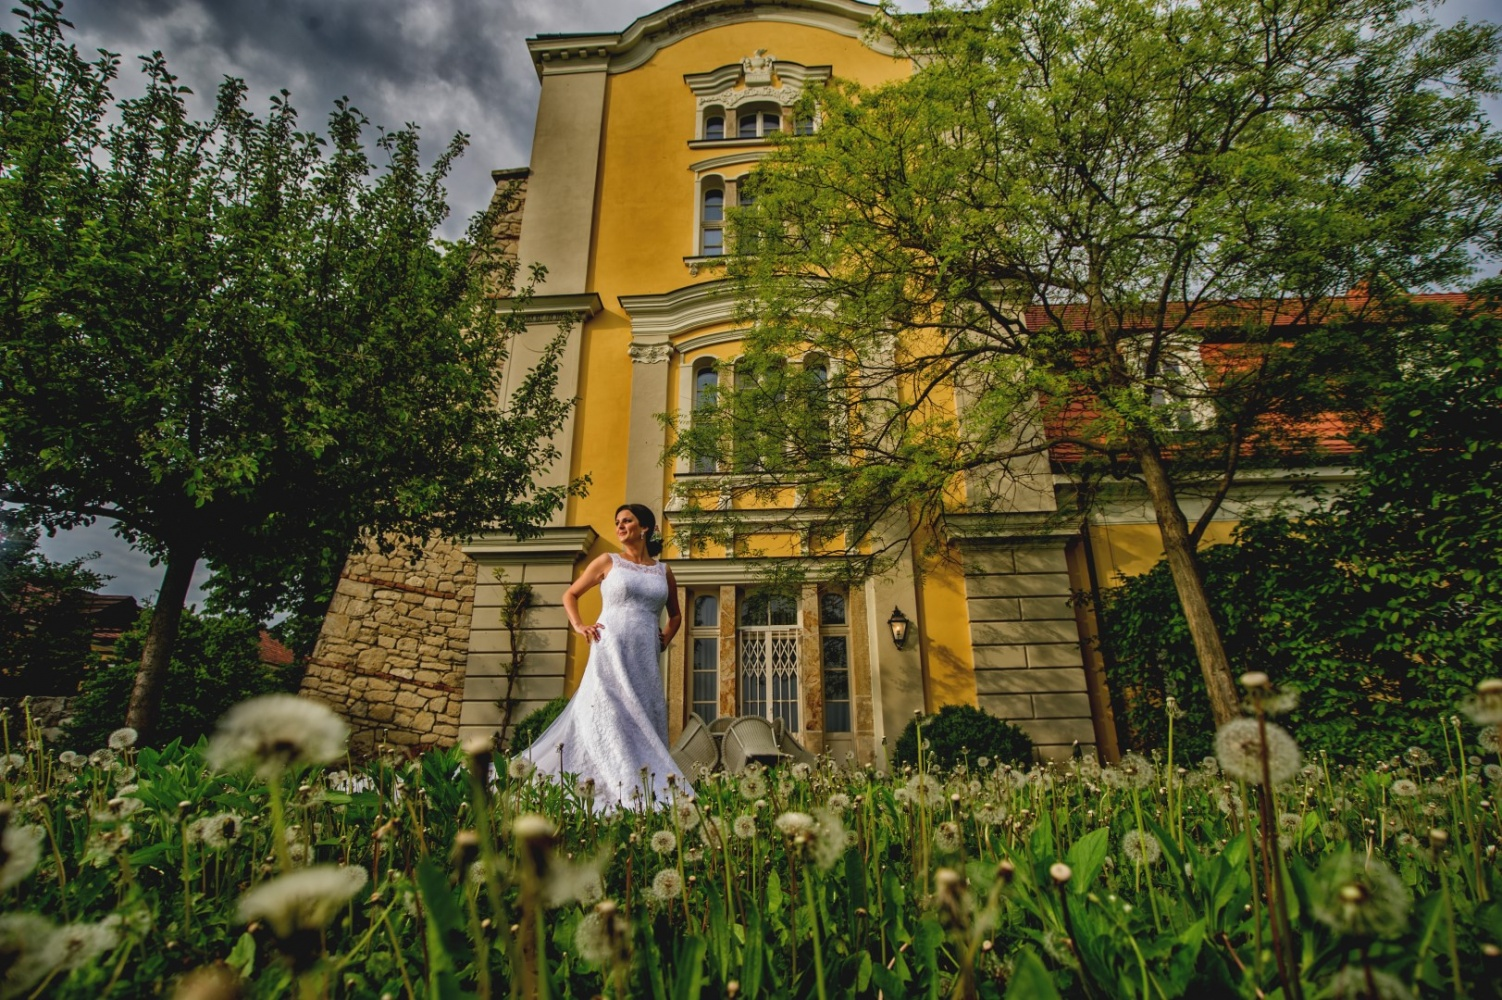 http://www.fotoz.sk/images/gallery-35/normal/hotel-chateau-bela_hladam-fotografa_fotost-keresek_eskuvoi-fotos_fotograf-nitrasvadobny-fotograf_najlepsi-fotograf_svadobne-fotenie__fotograf-na-svadbu_juraj-zsok_064.jpg